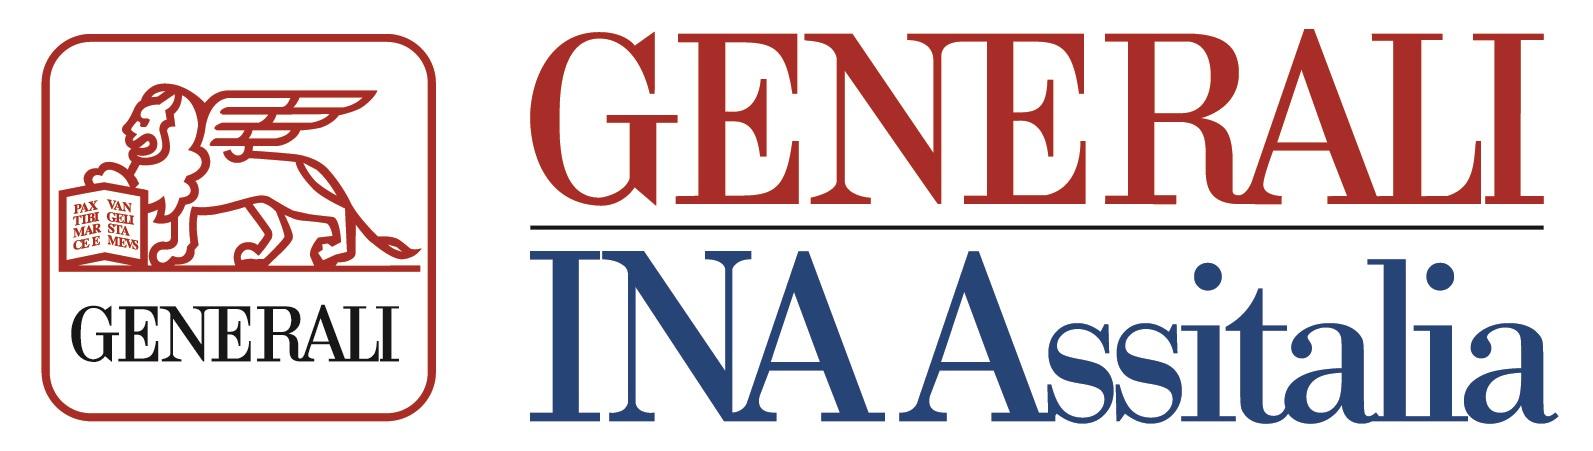 generali_ina_assitalia